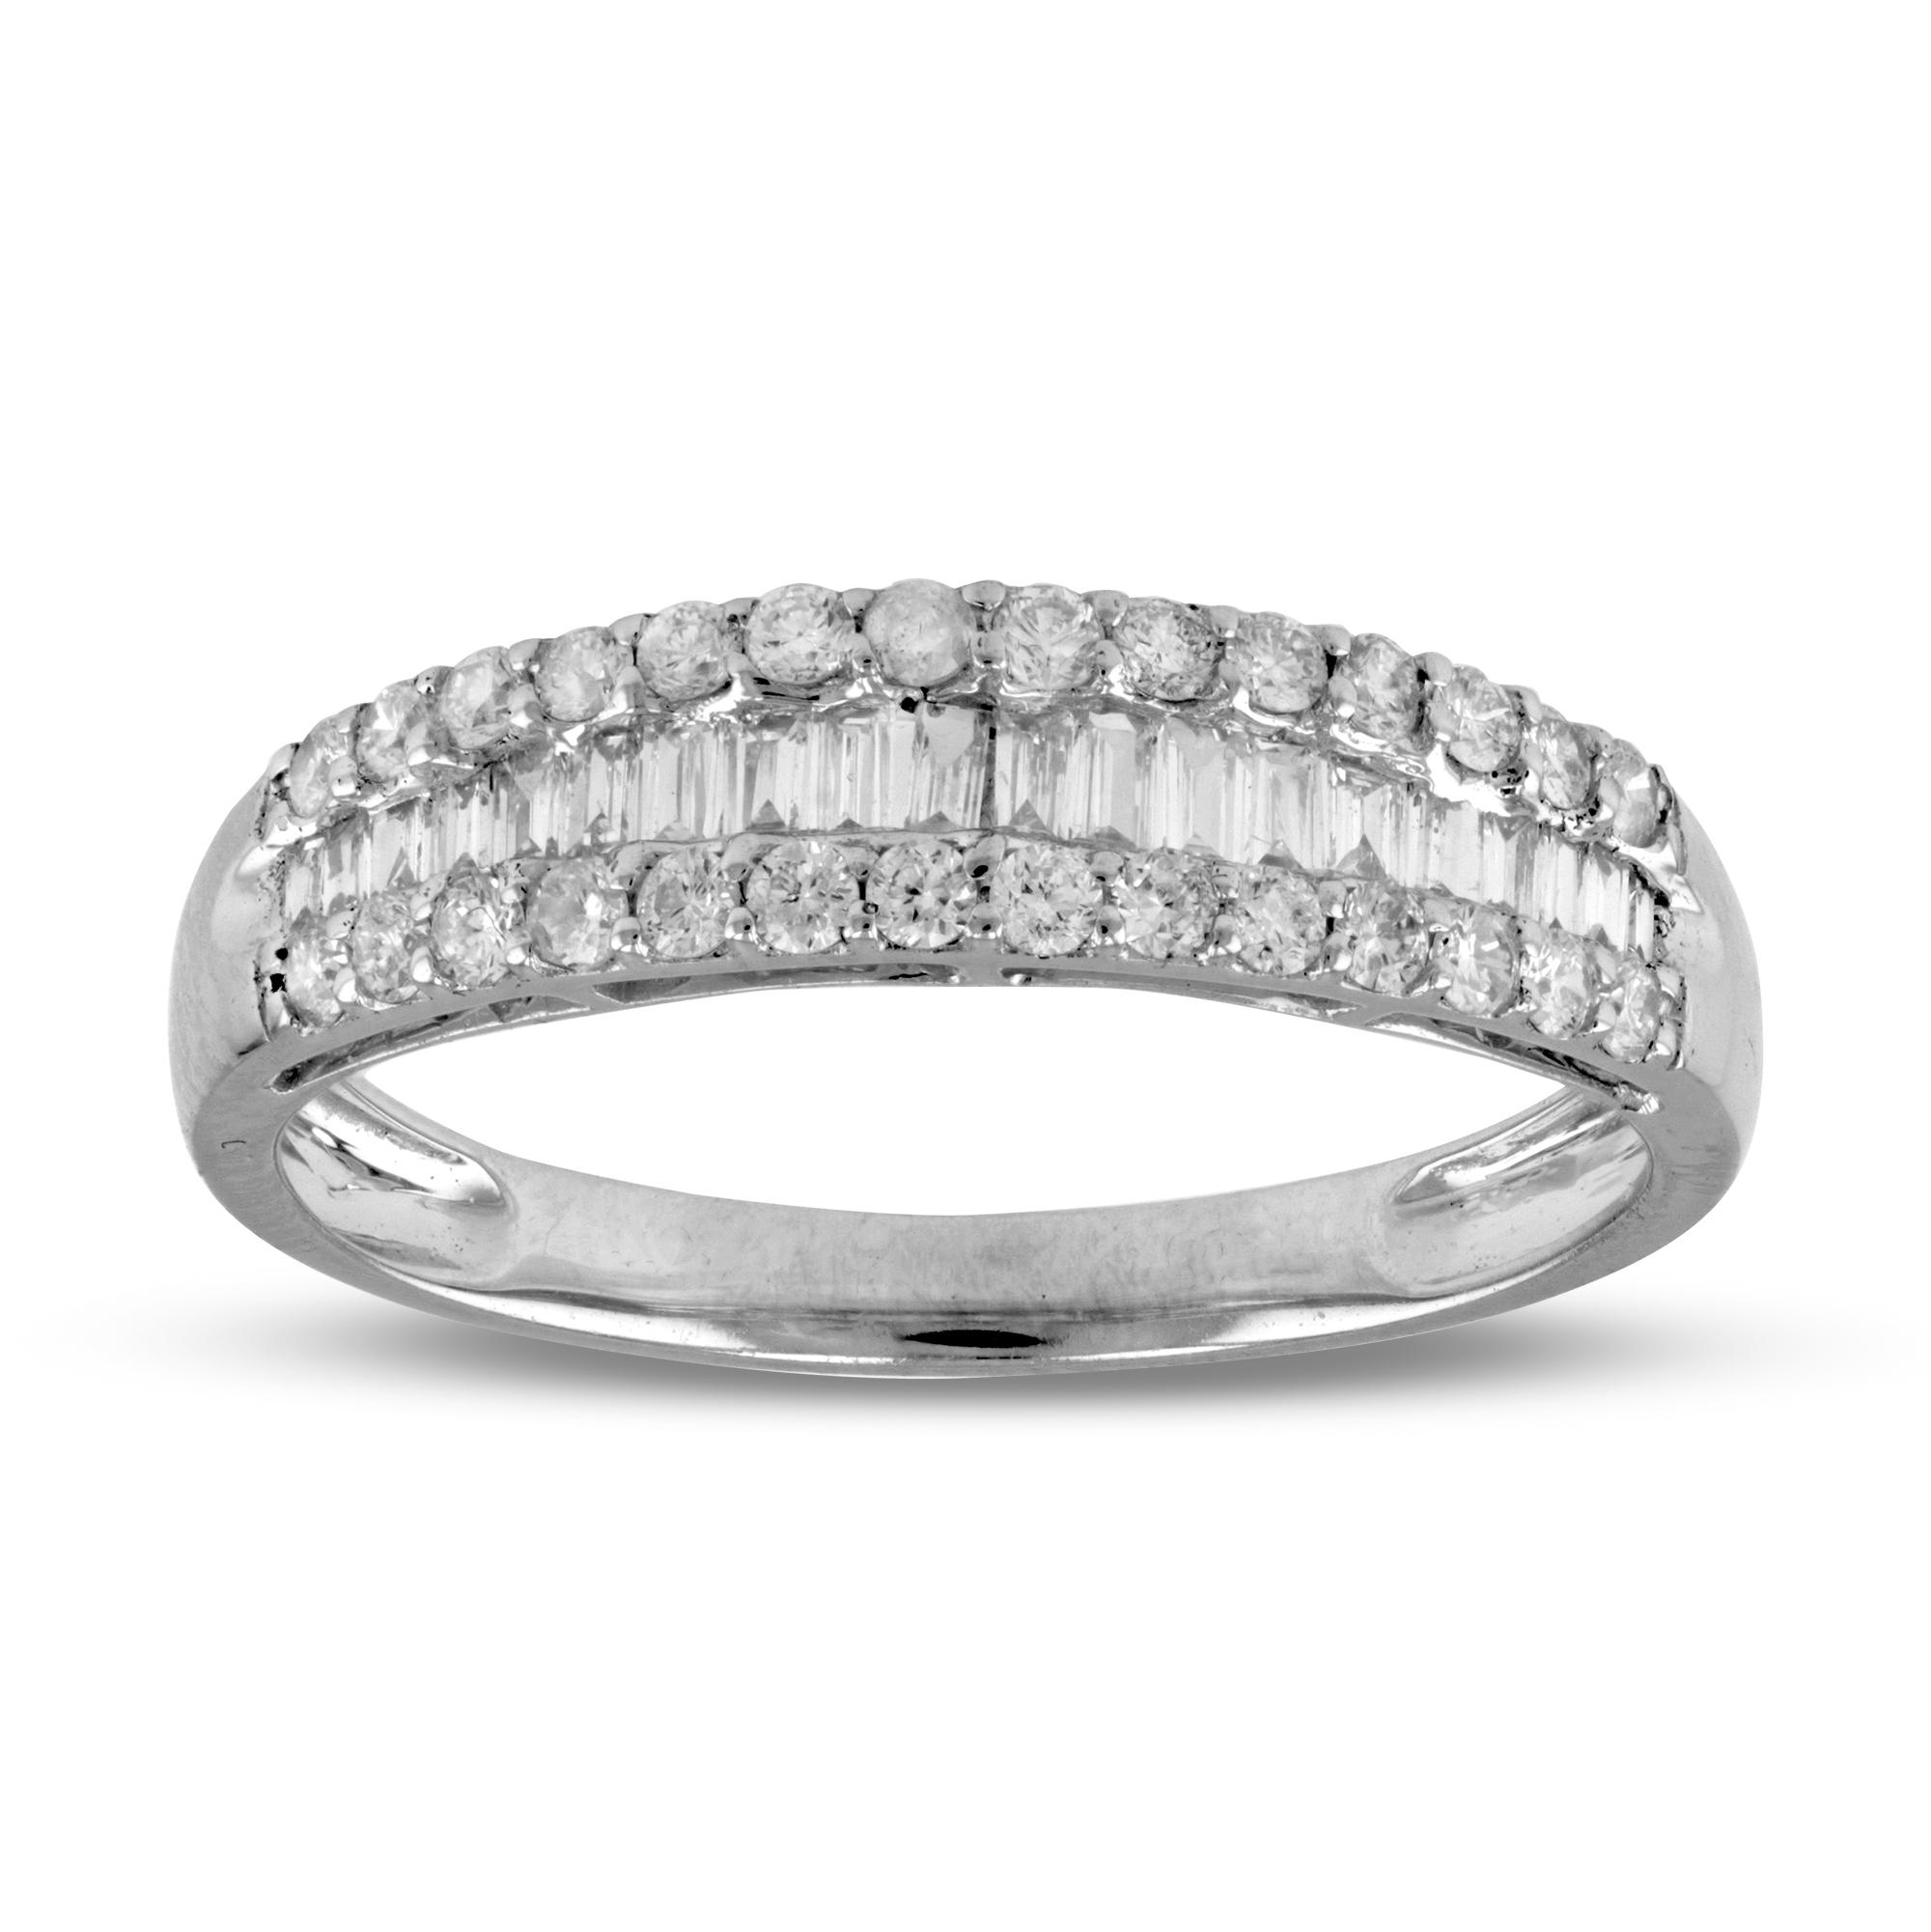 View 0.49ctw Diamond Wedding Band in 18k White Gold